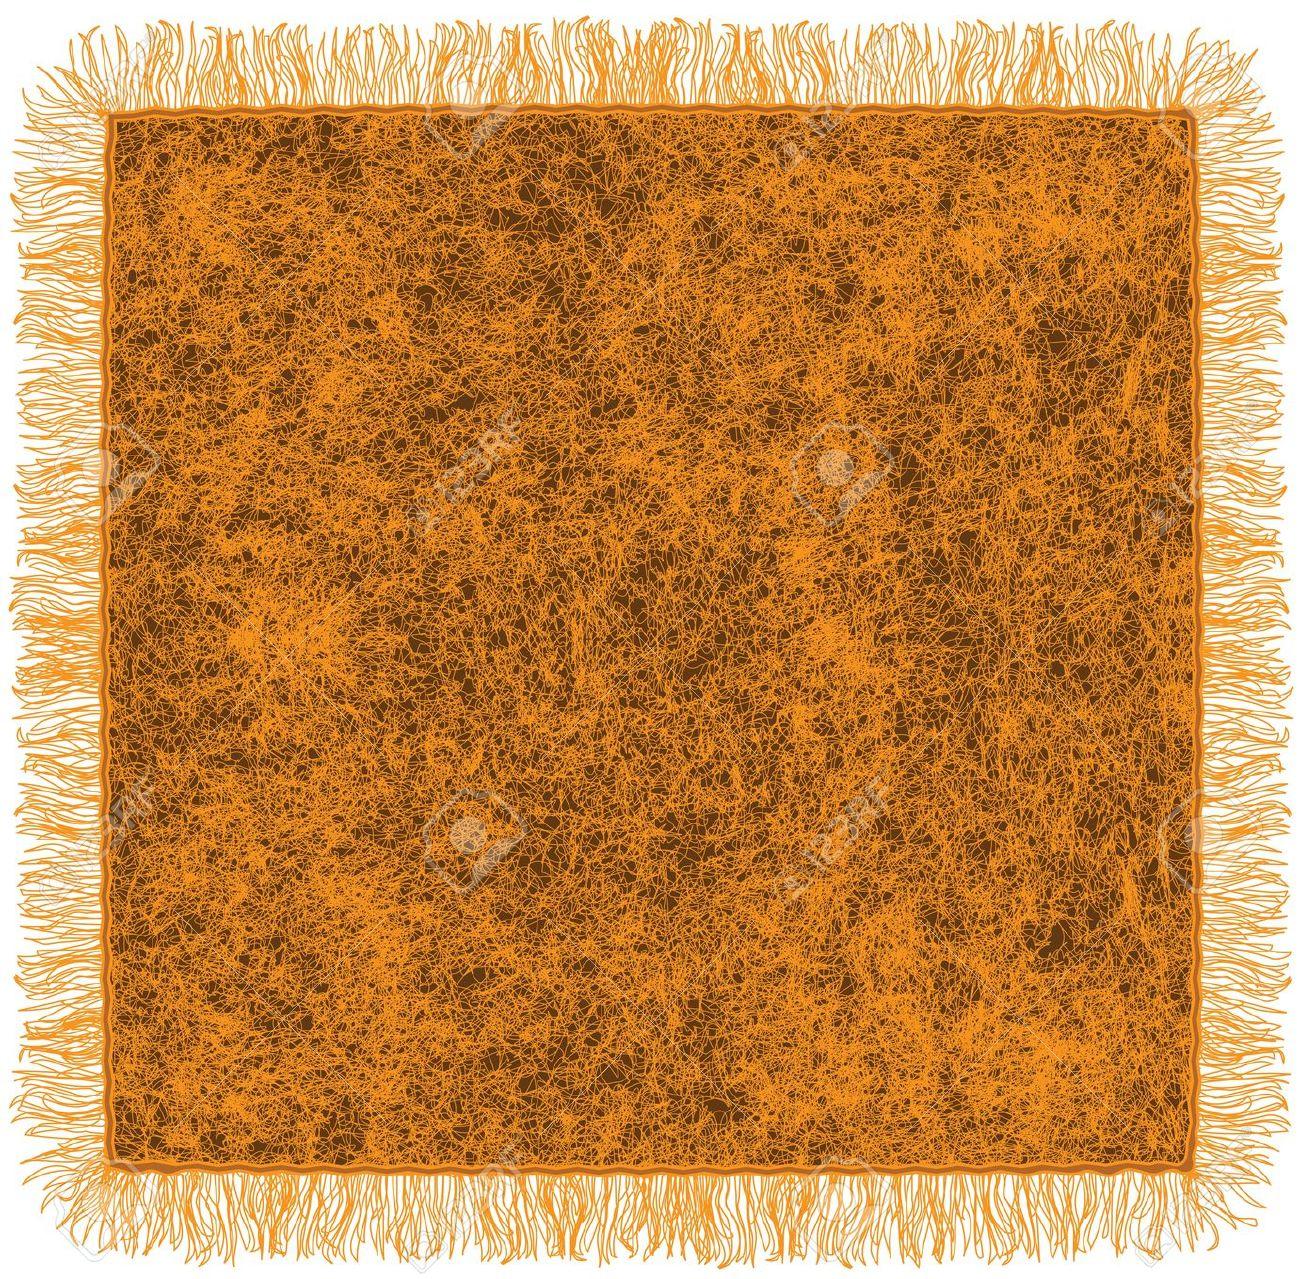 1300x1279 Carpet Clipart Fringe